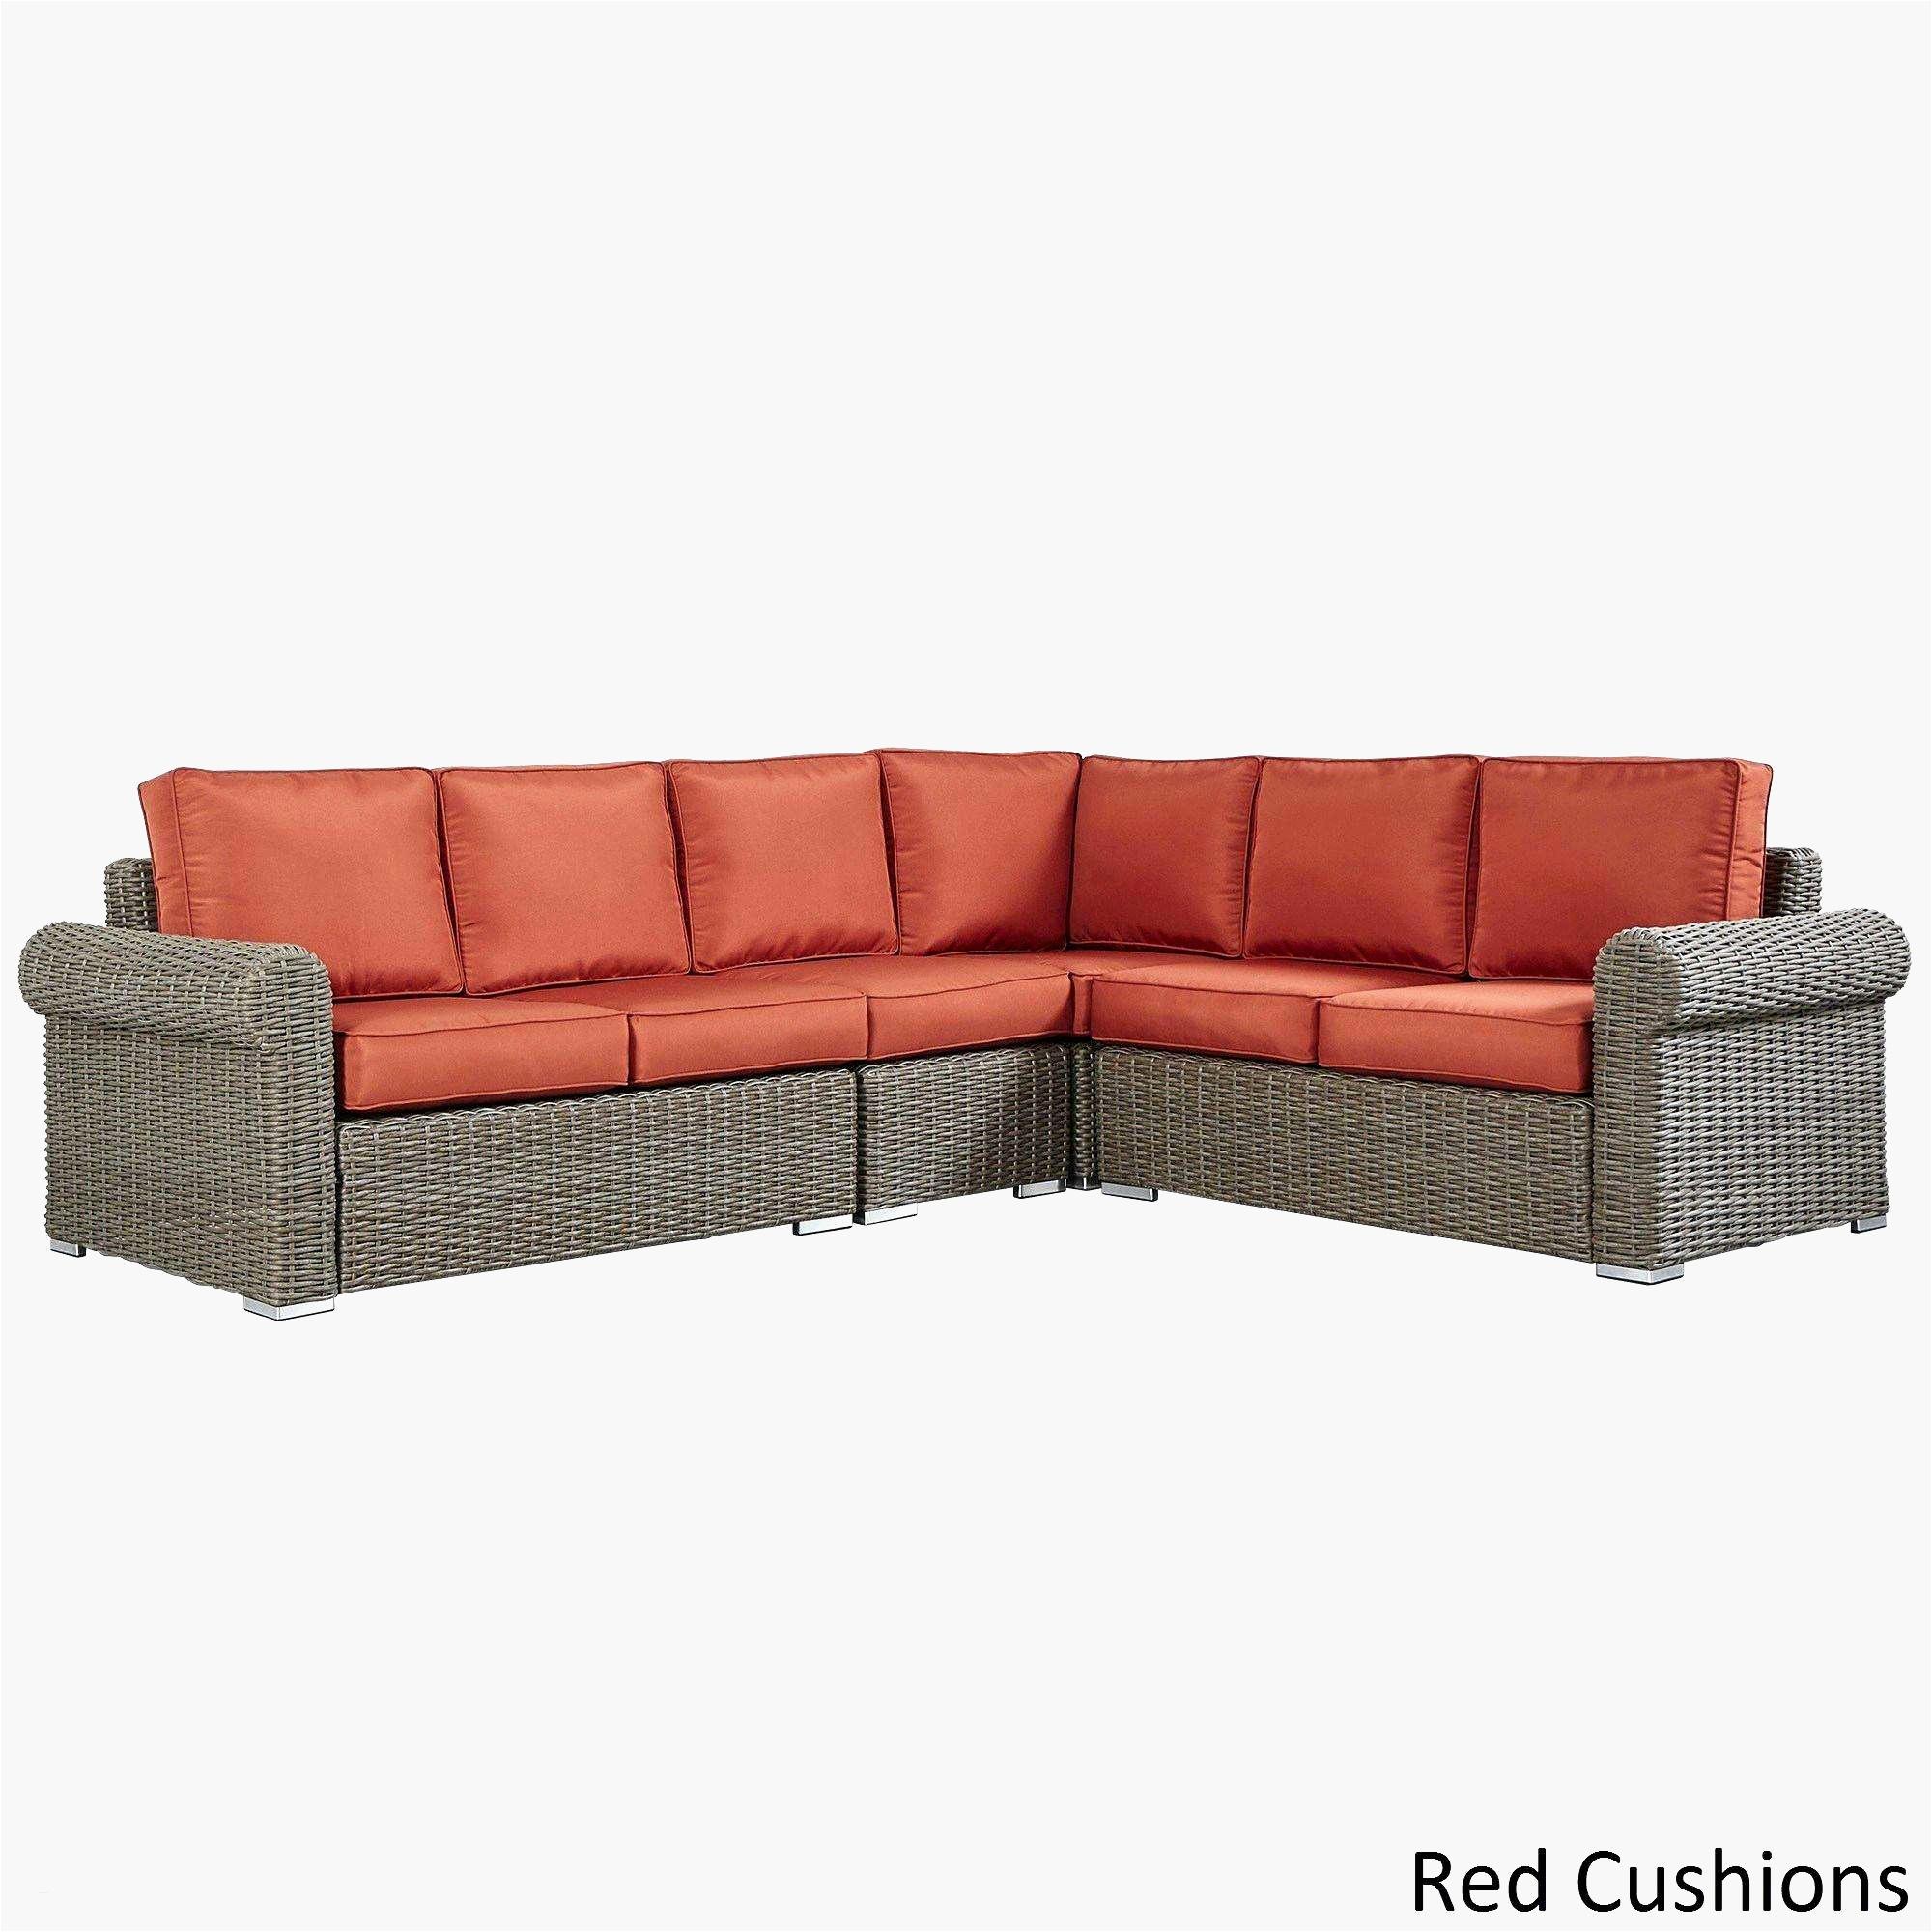 joss and main outdoor furniture awesome 50 luxury joss and main sleeper sofa 50 s image